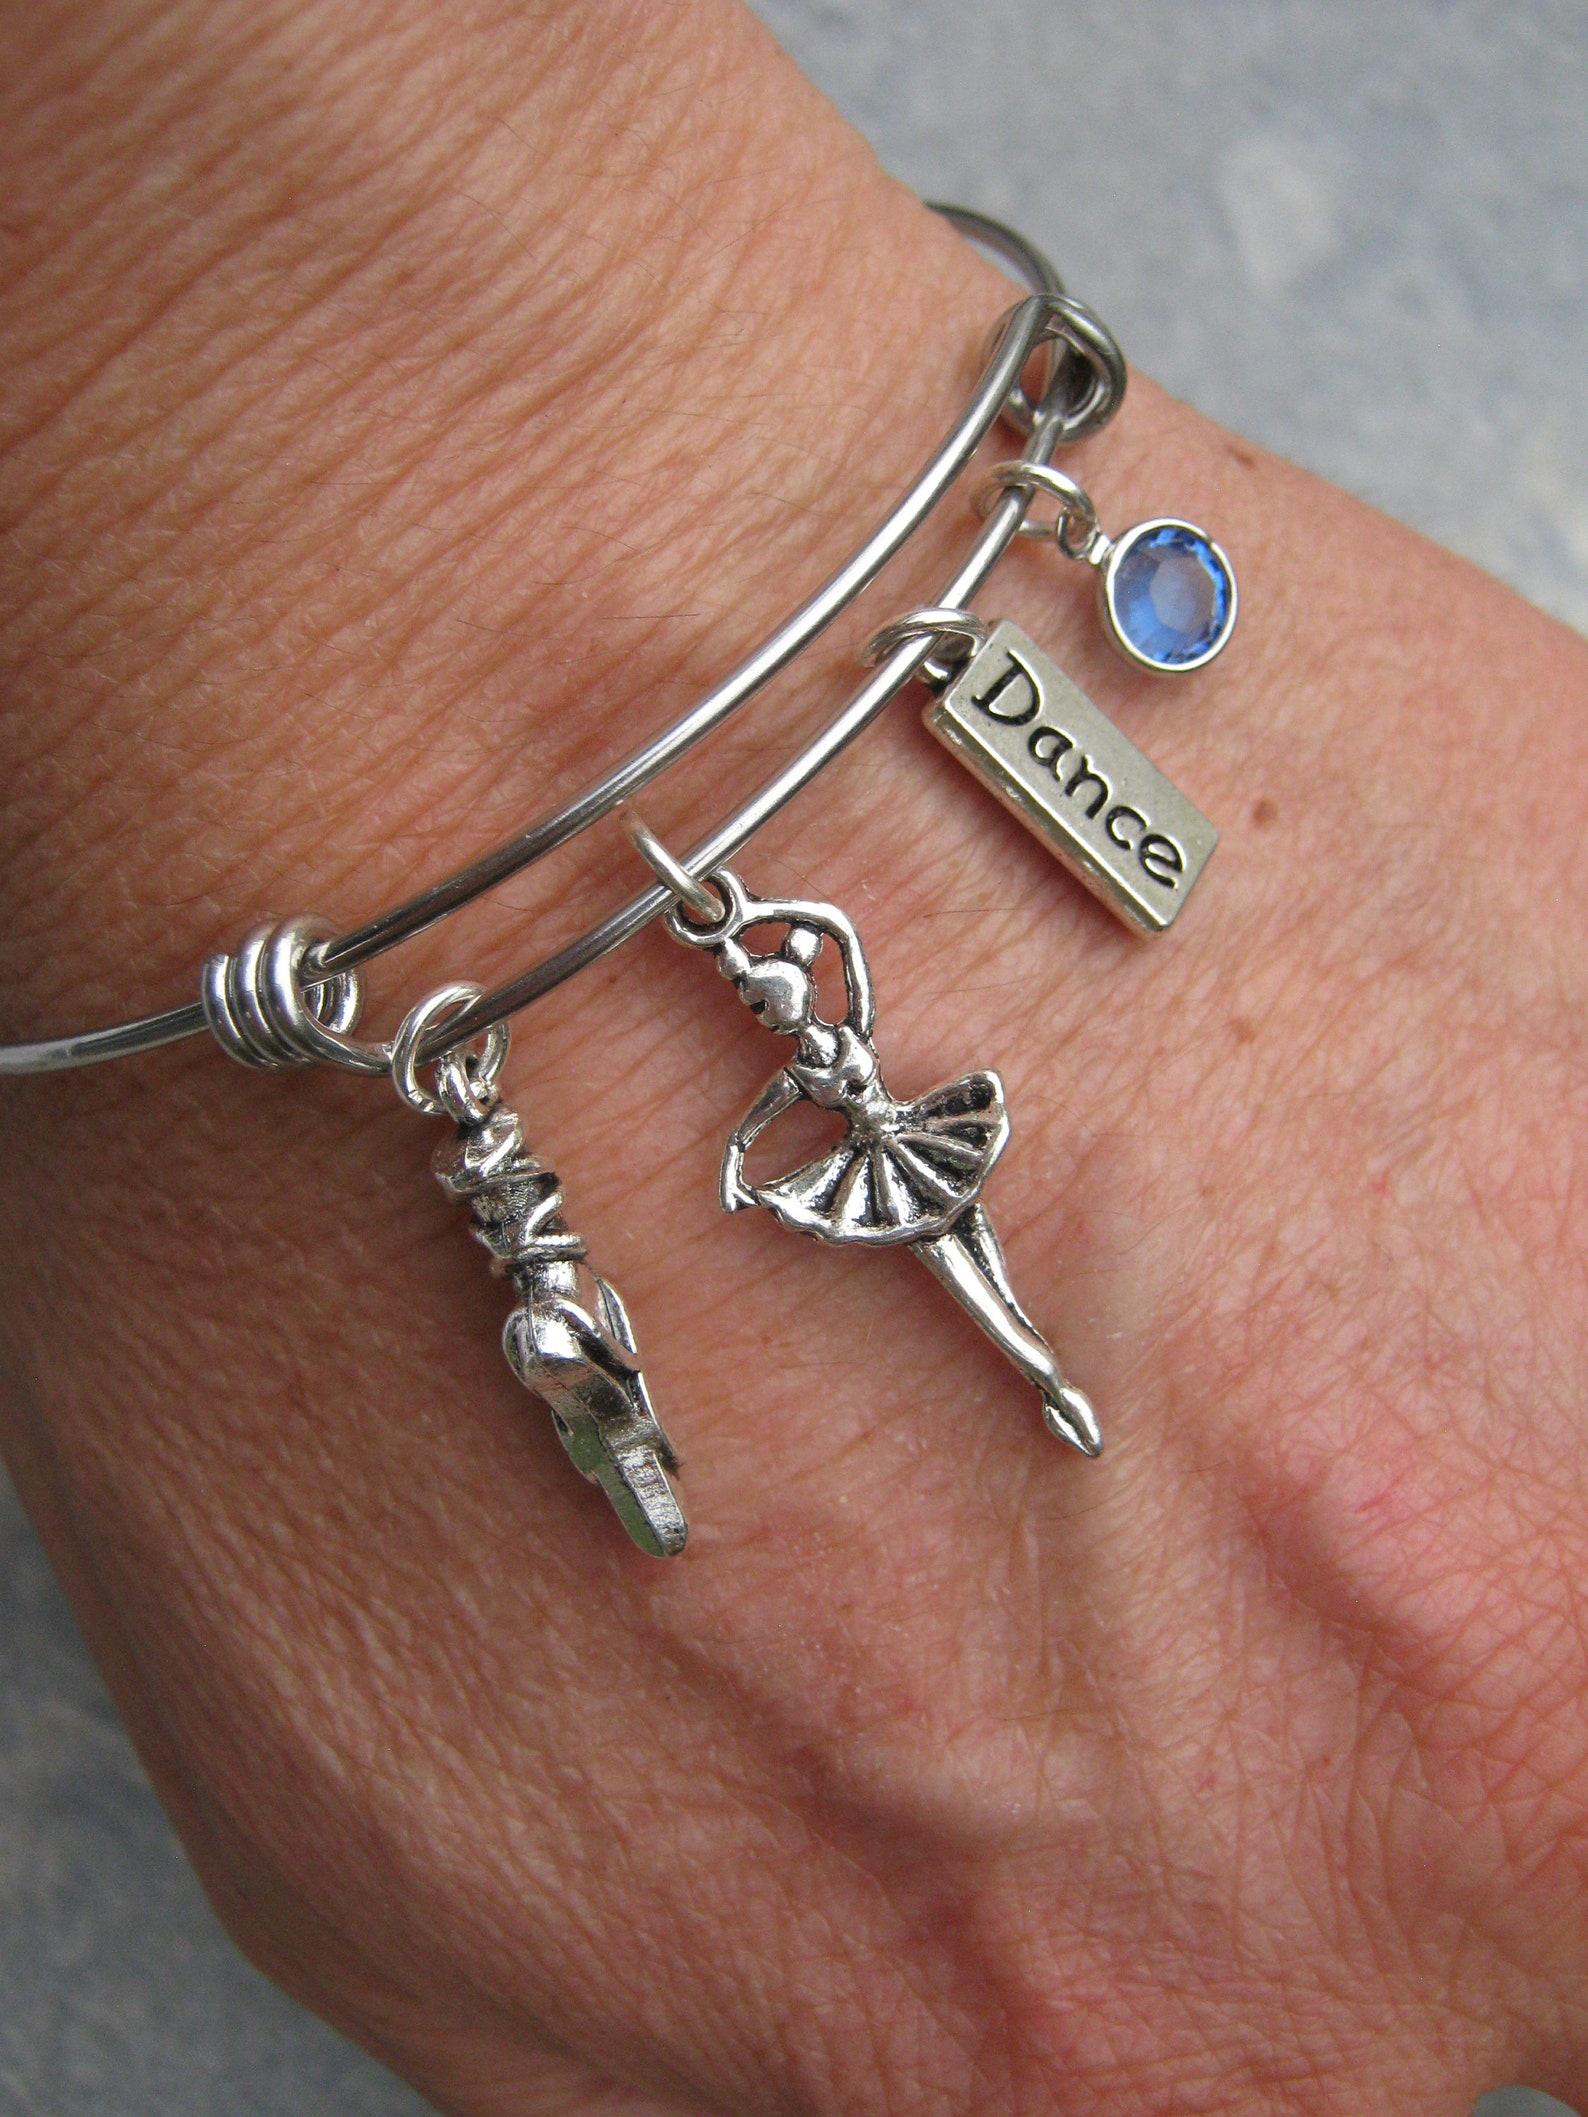 personalized ballerina bracelet, expandable bangle bracelet, stainless steel bracelet, dance jewelry, ballet shoe slipper, athle